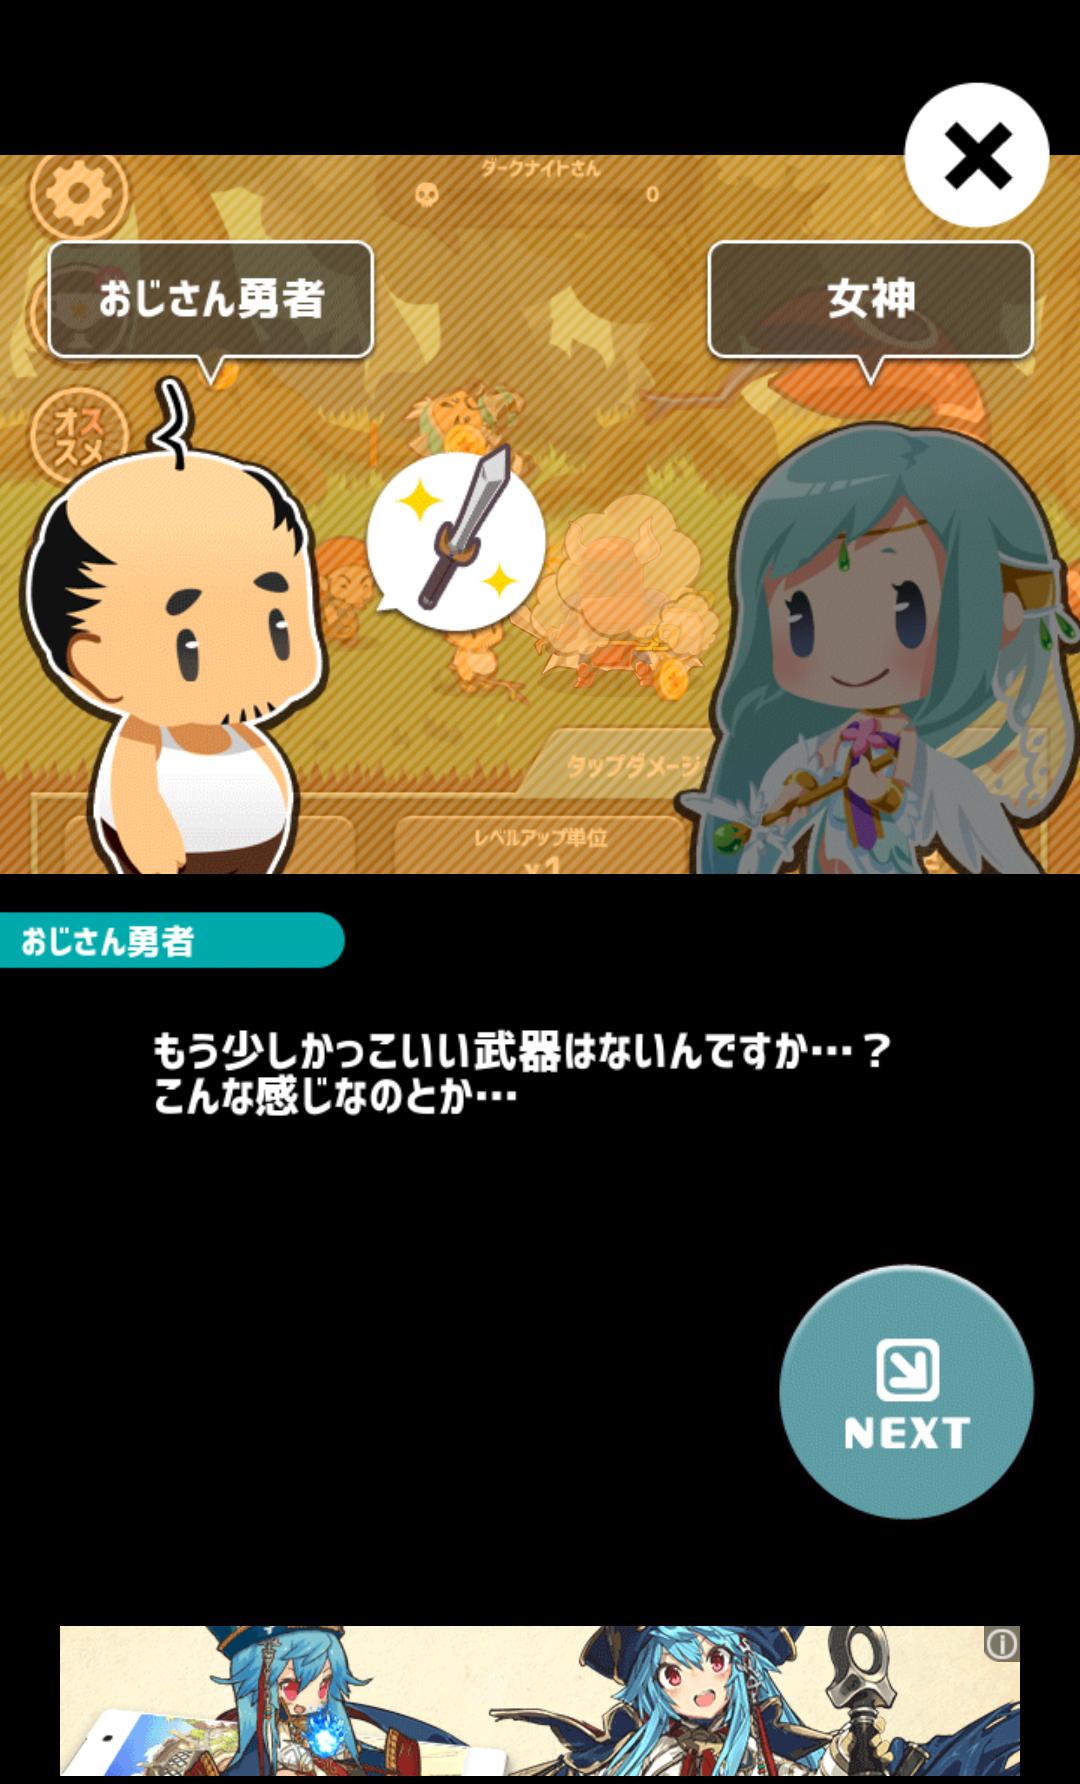 androidアプリ おじクエ - OJISAN QUEST -攻略スクリーンショット4